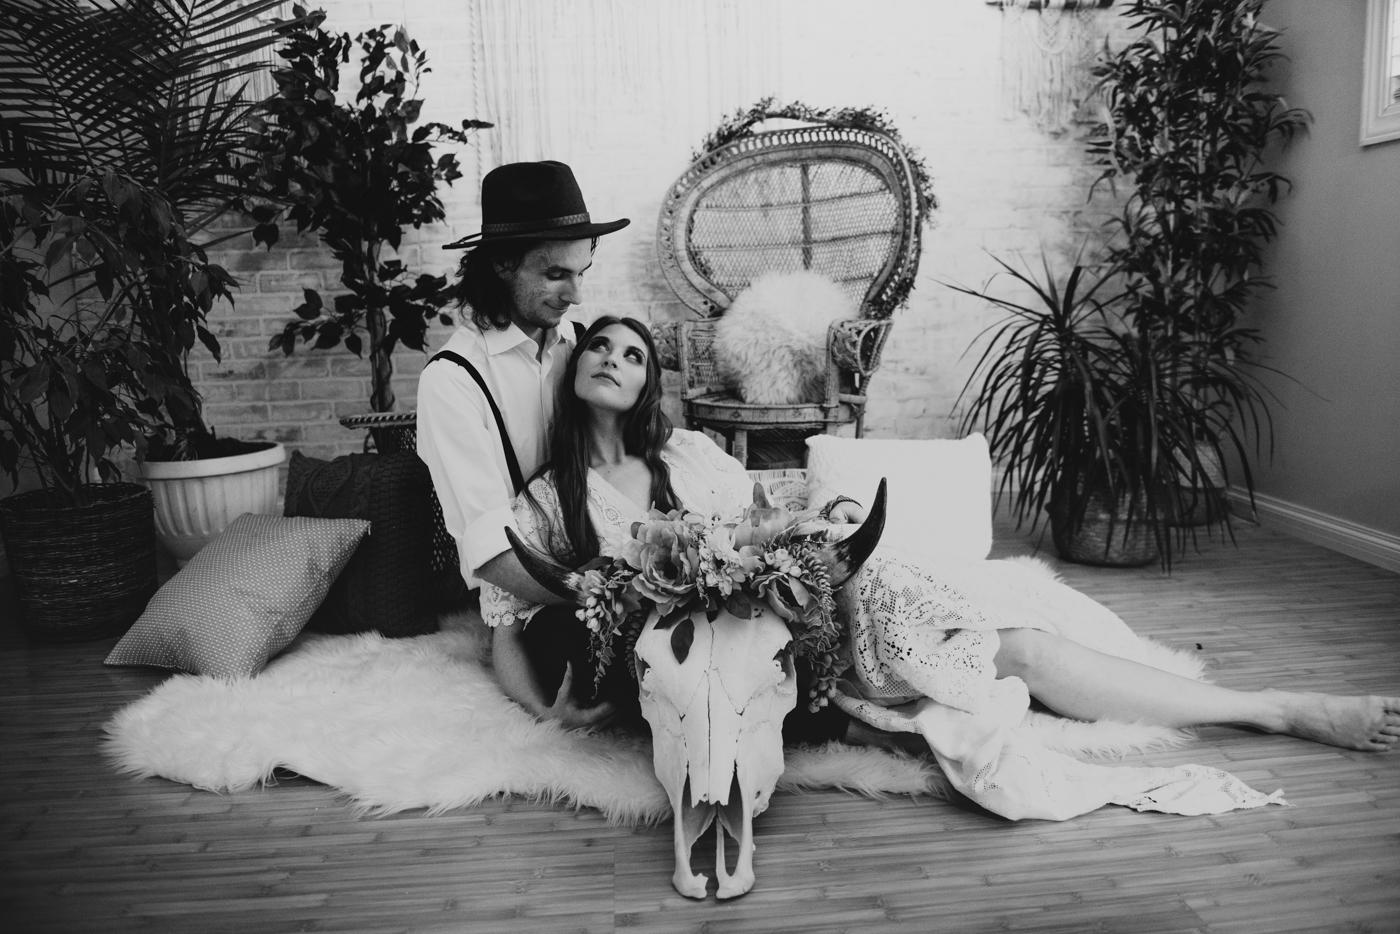 FortSt.John_photographer_TyraEPhotography_Wedding_Couple_Family_Photograhy_DawsonCreek_Elopement_Bride_Boduoir_Portraits-4796.jpg